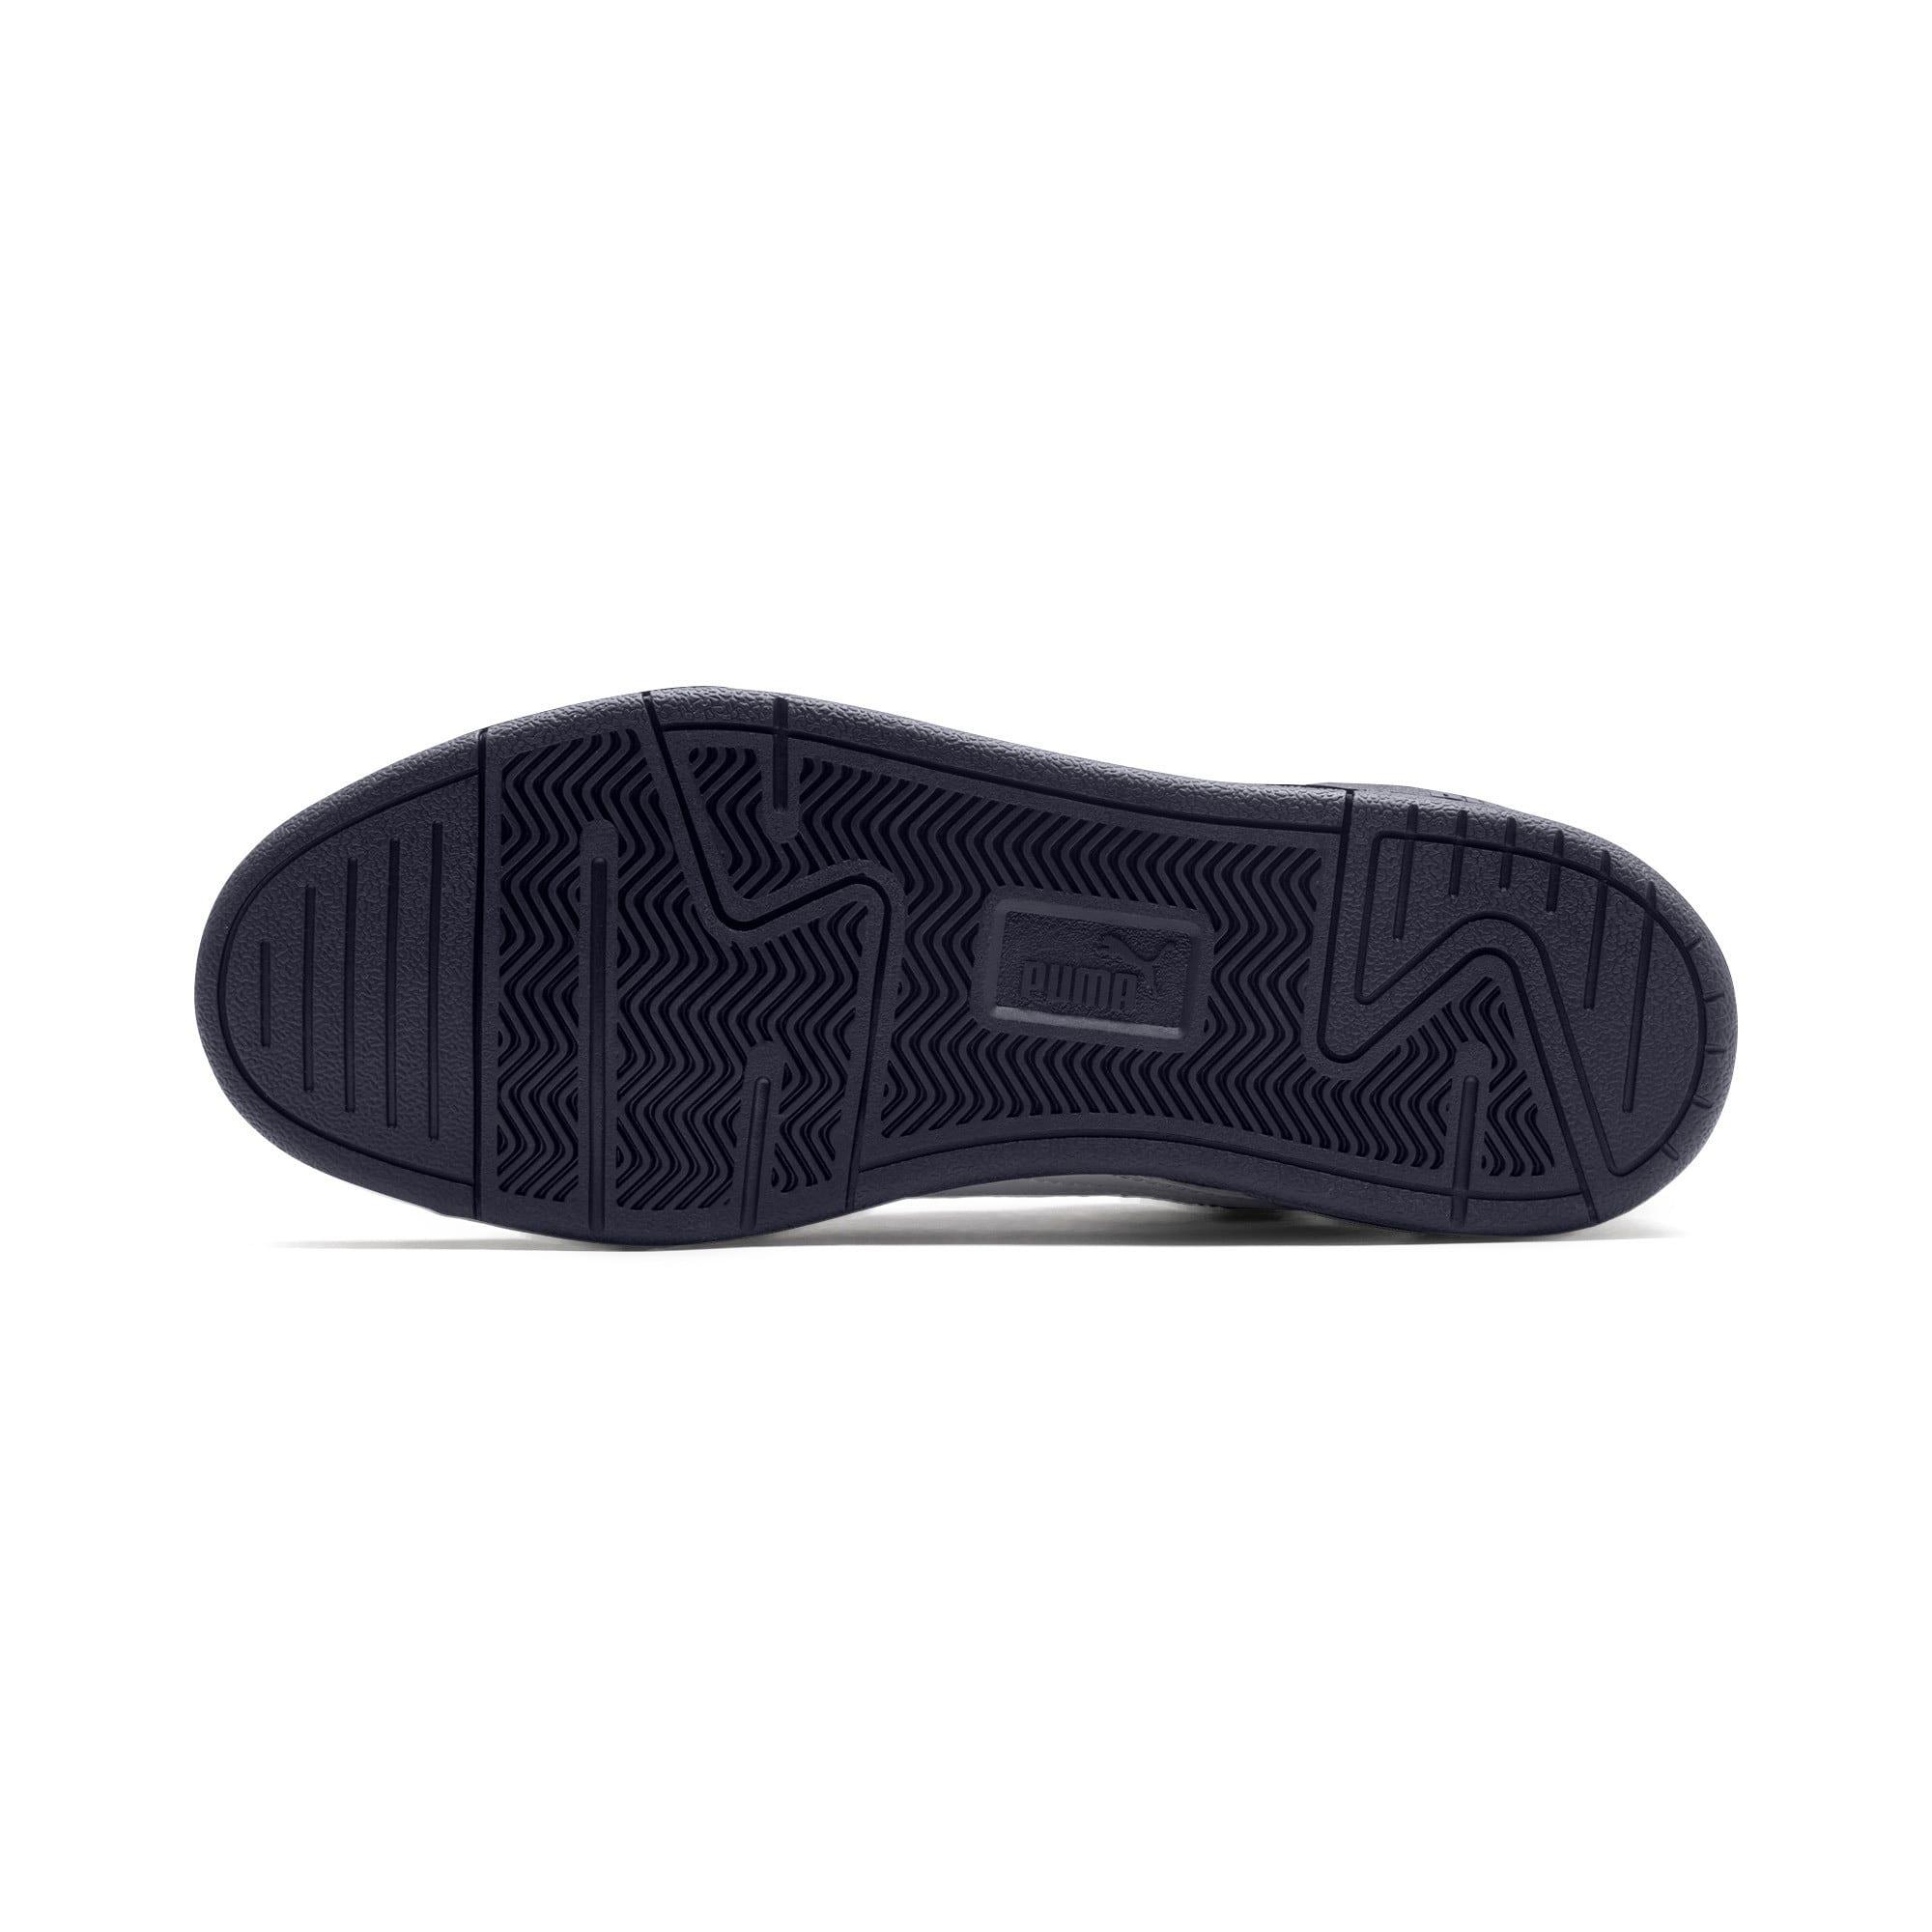 Thumbnail 5 of Red Bull Racing Caracal sneakers, NIGHT SKY-PumaWhite-NIGHTSKY, medium